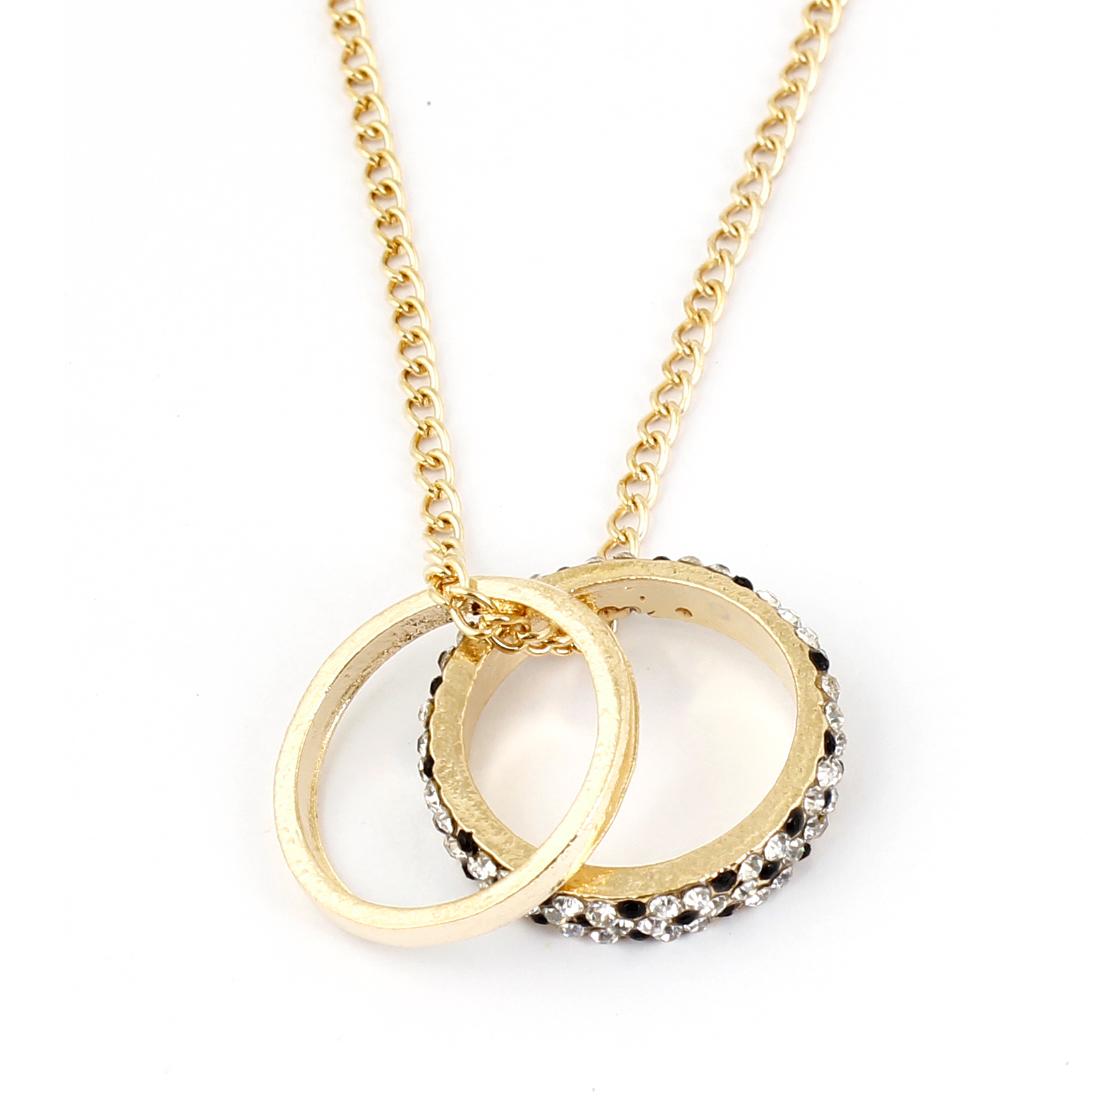 Black White Rhinestones Inlaid Dual Circles Pendant Sweater Chain Gold Tone